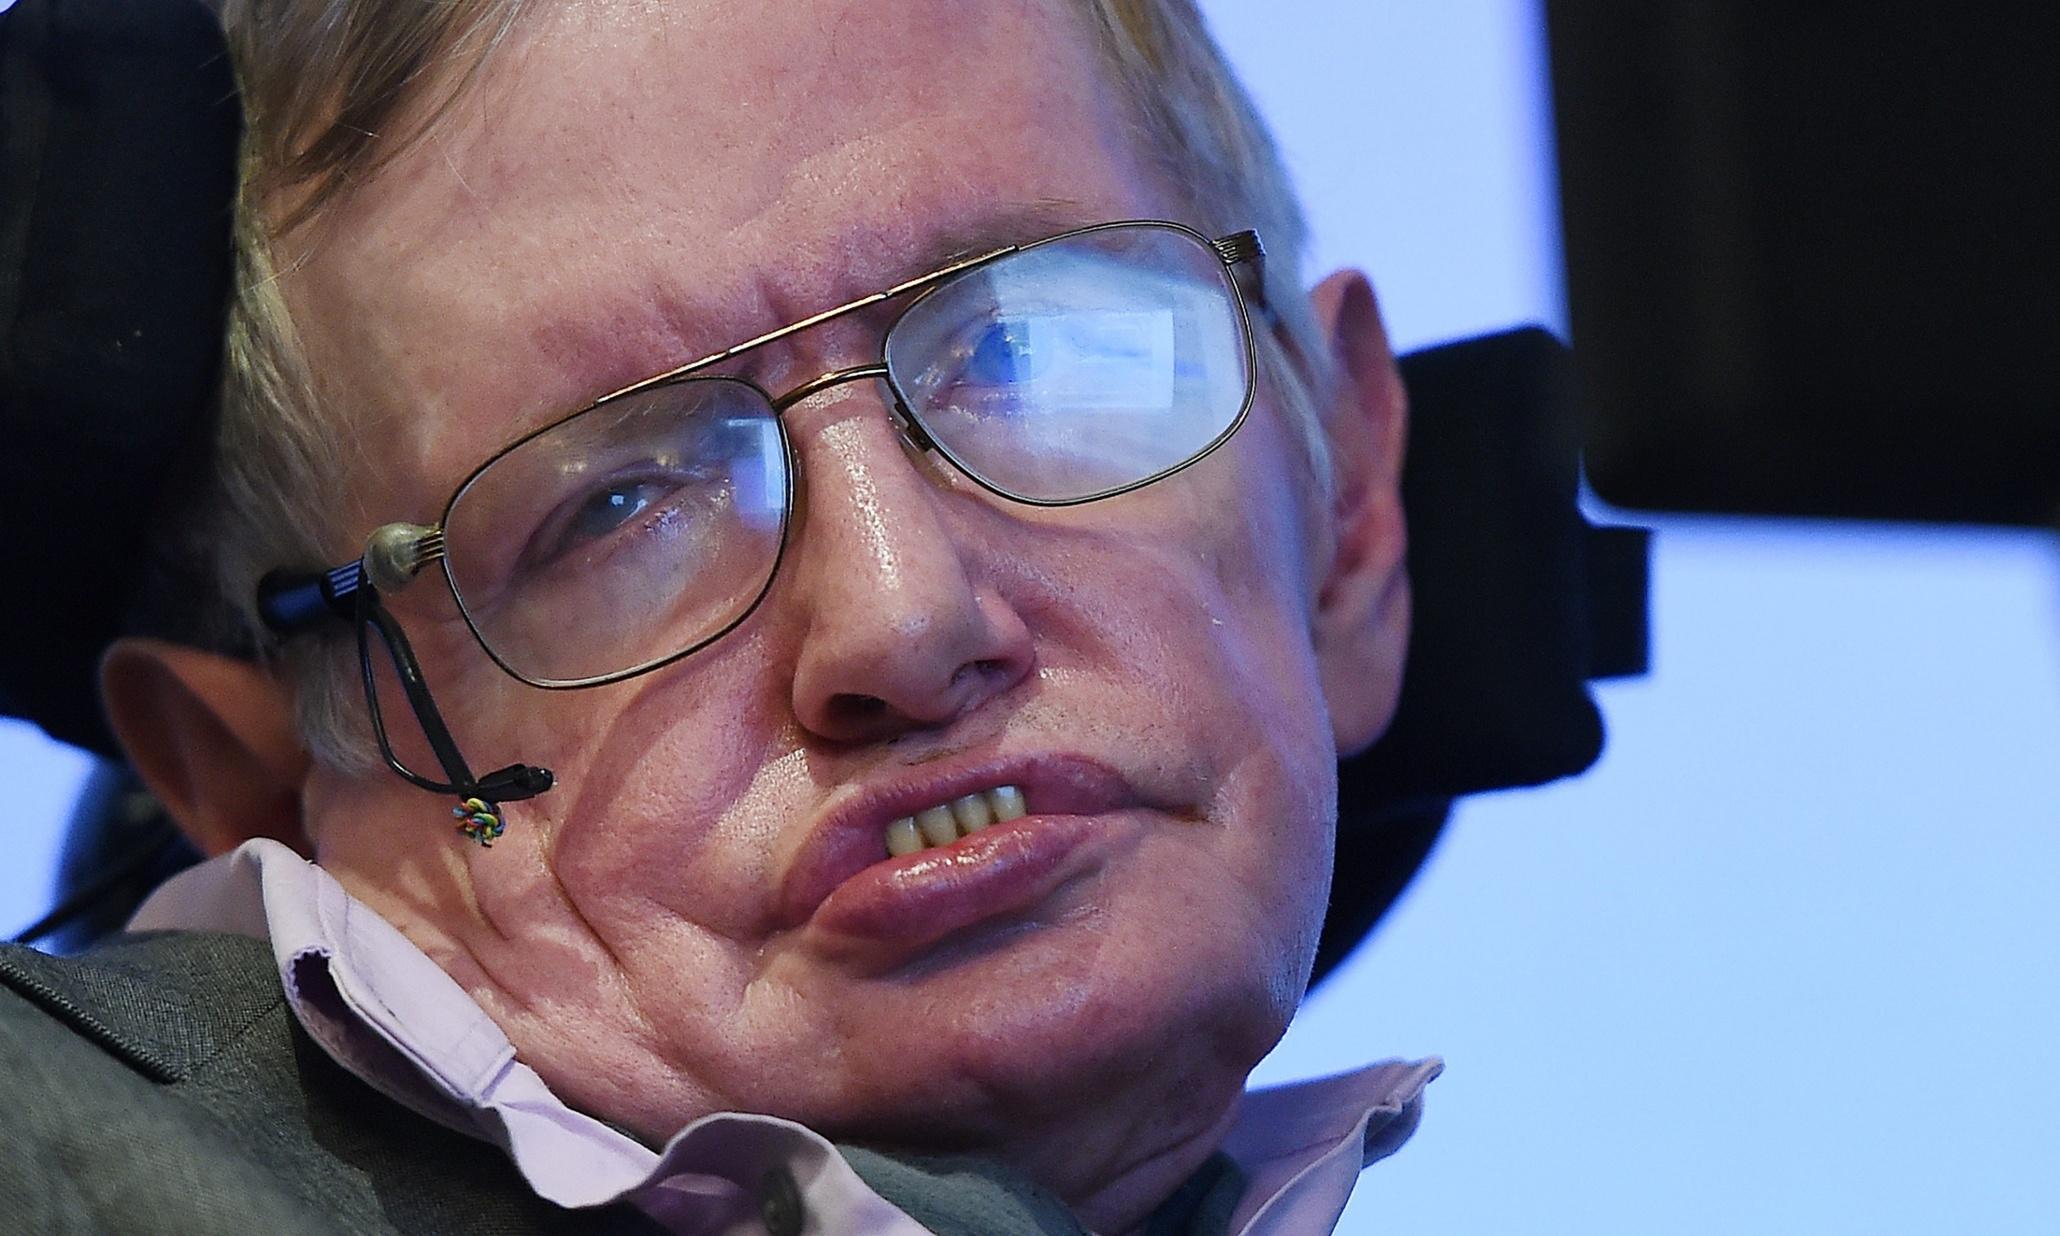 Stephen Hawking tells fans Zayn Malik could still be in a parallel One Direction